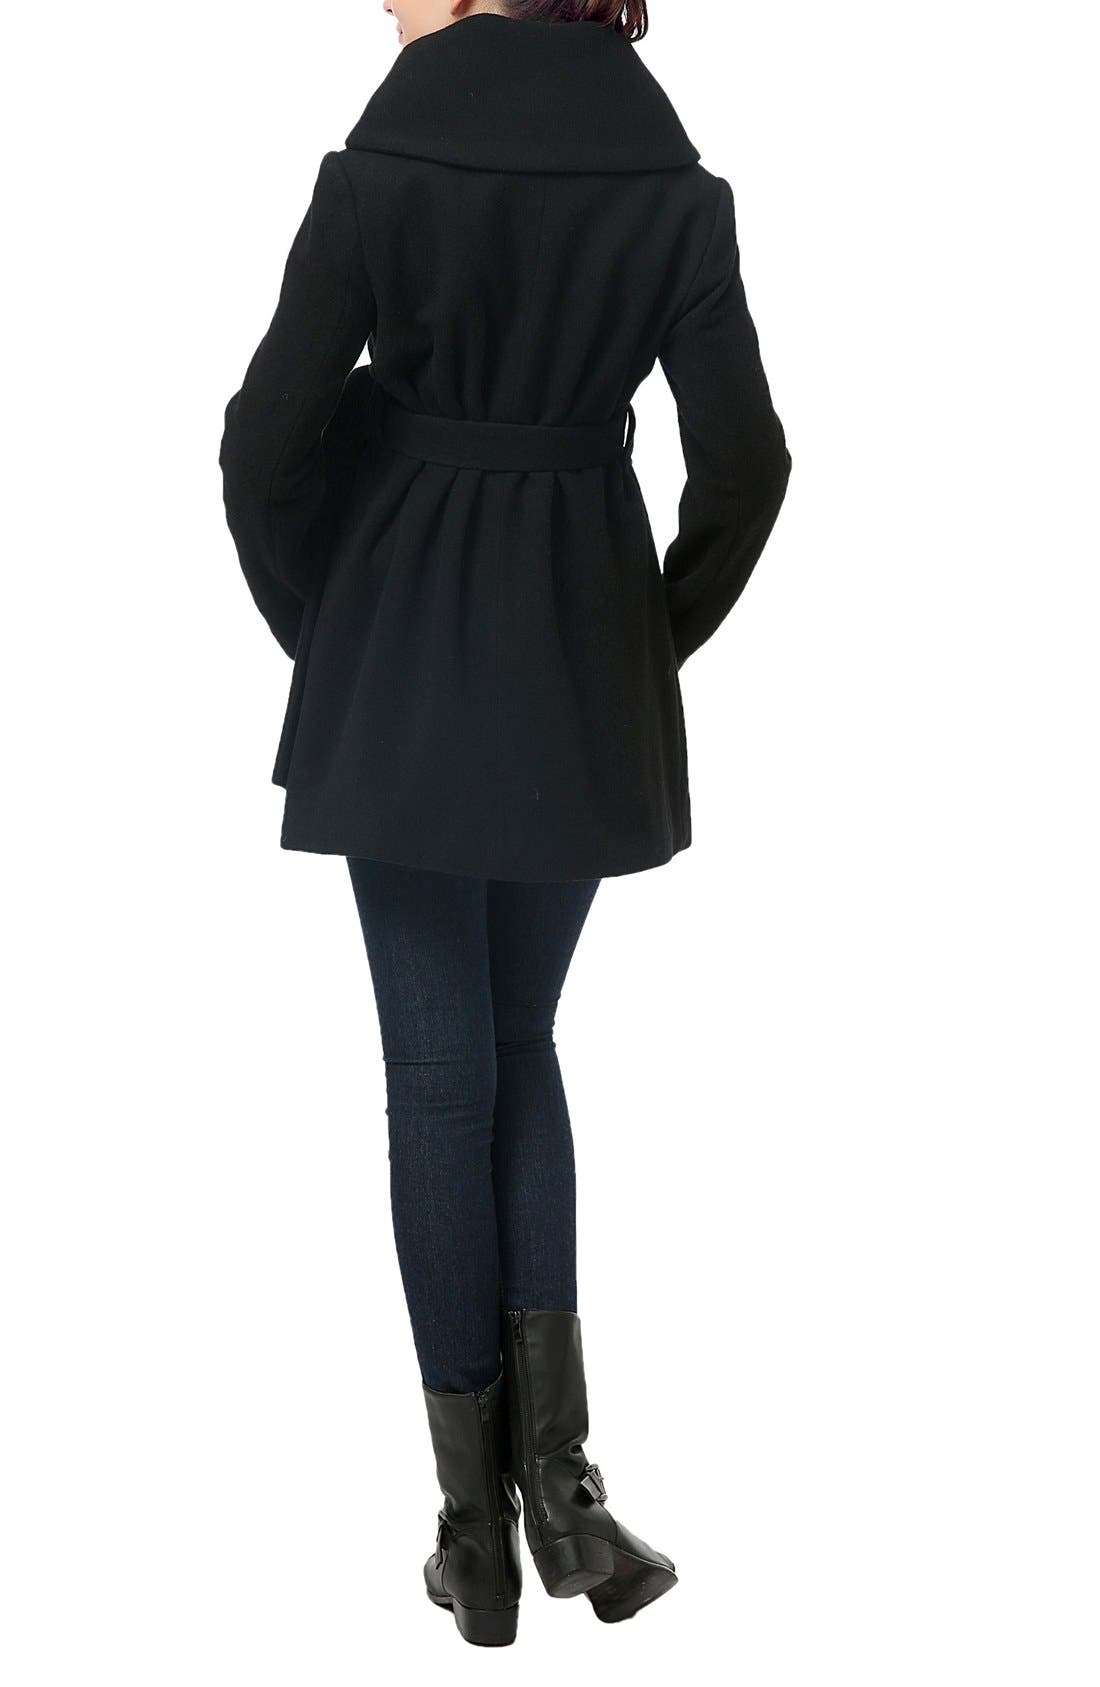 'Mia' High Collar Maternity Coat,                             Alternate thumbnail 2, color,                             BLACK